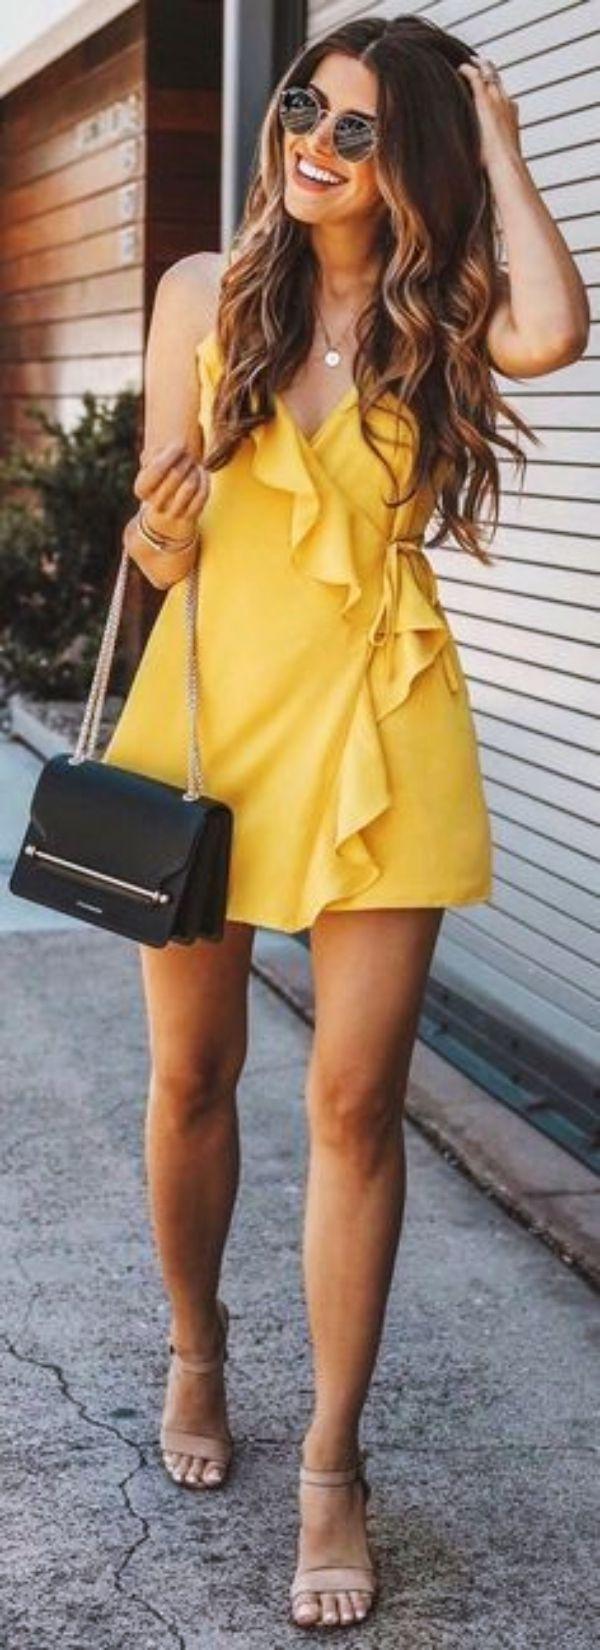 78ac4c62fbc6 Wrap Dresses And Outfits Ideas.  wraps  dresses  outfits  ideas  women   womensfashion  fashion